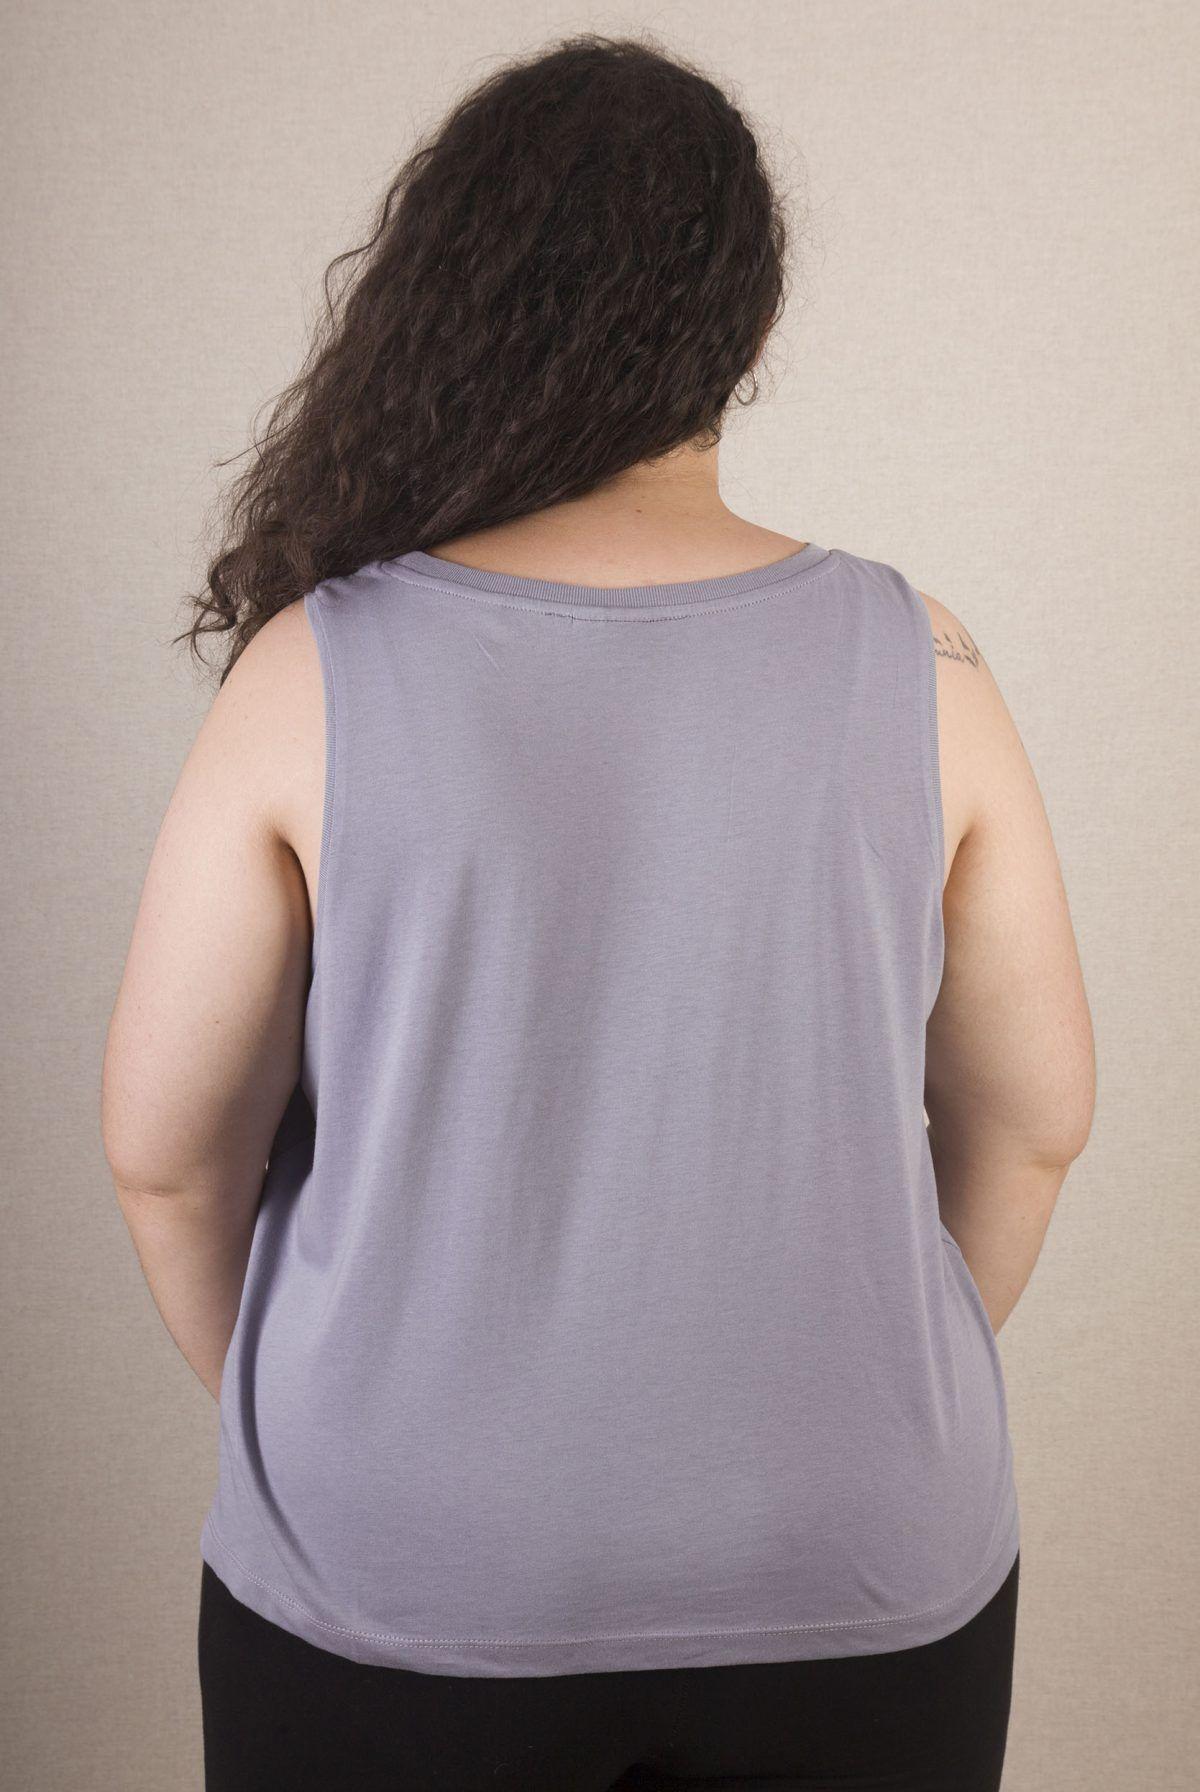 Camiseta mujer Leona tirantes-sirem wild